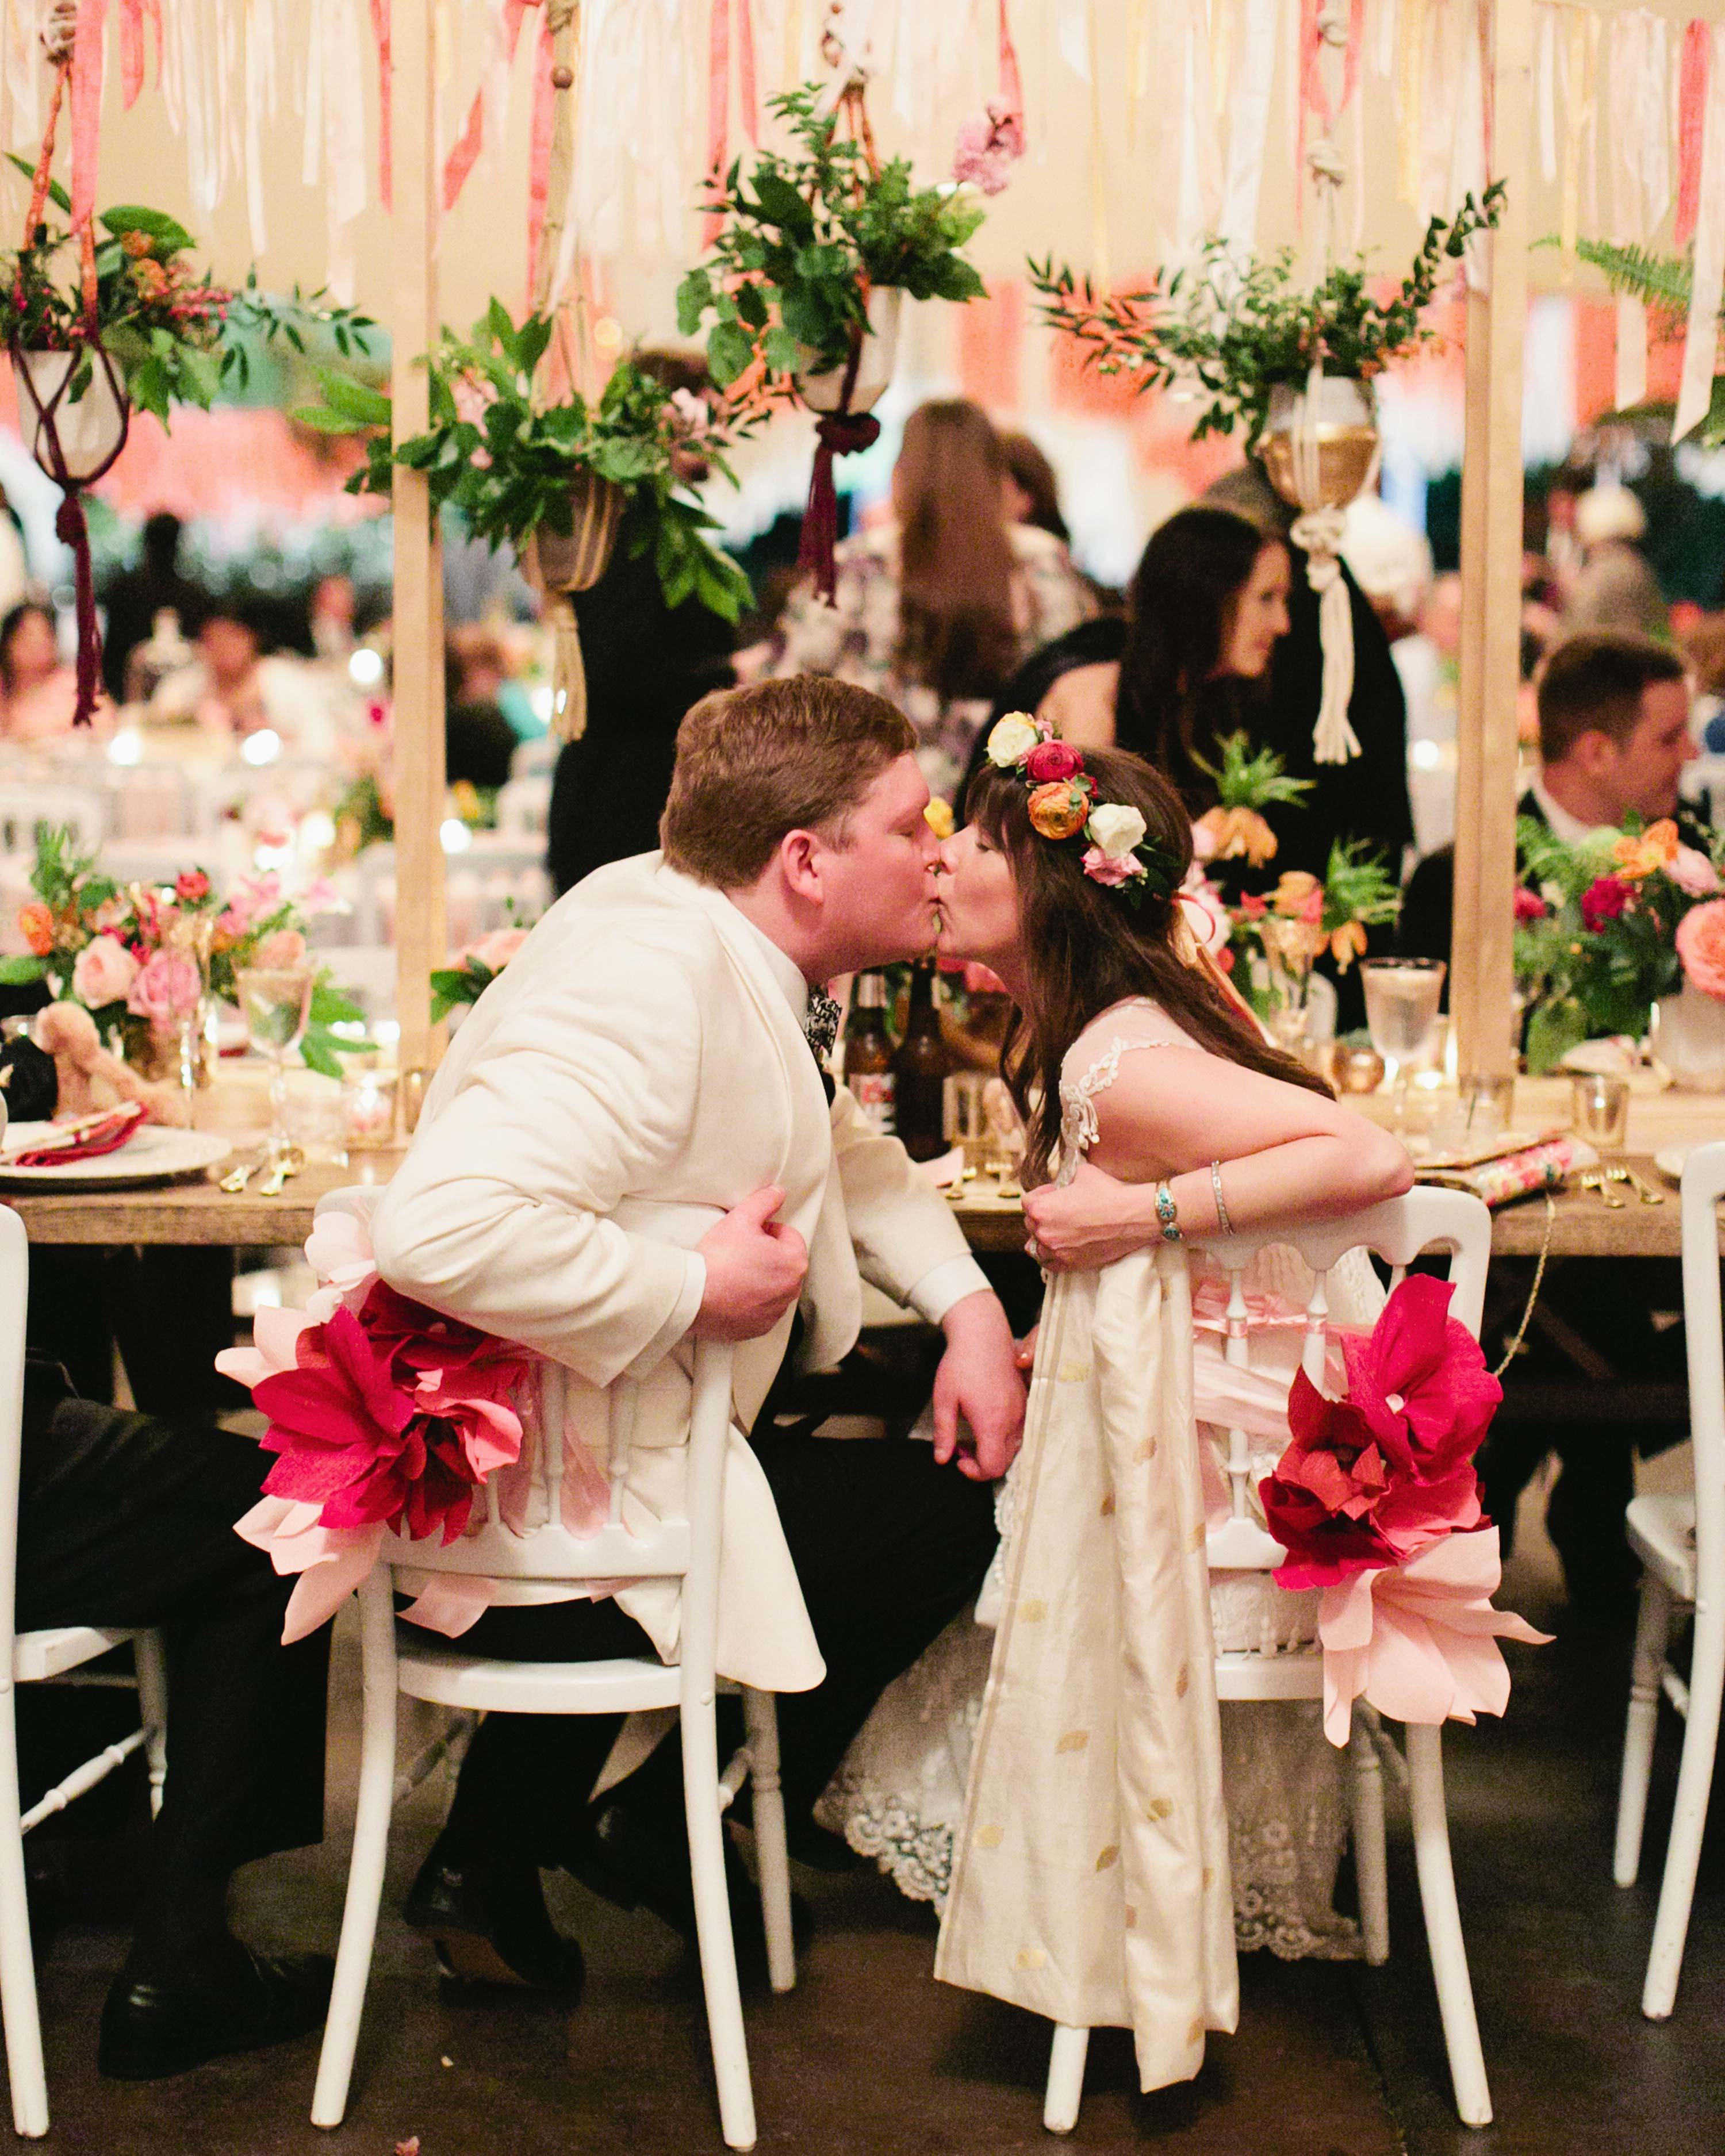 holly-john-wedding-texas-kiss-105-s112833-0516.jpg